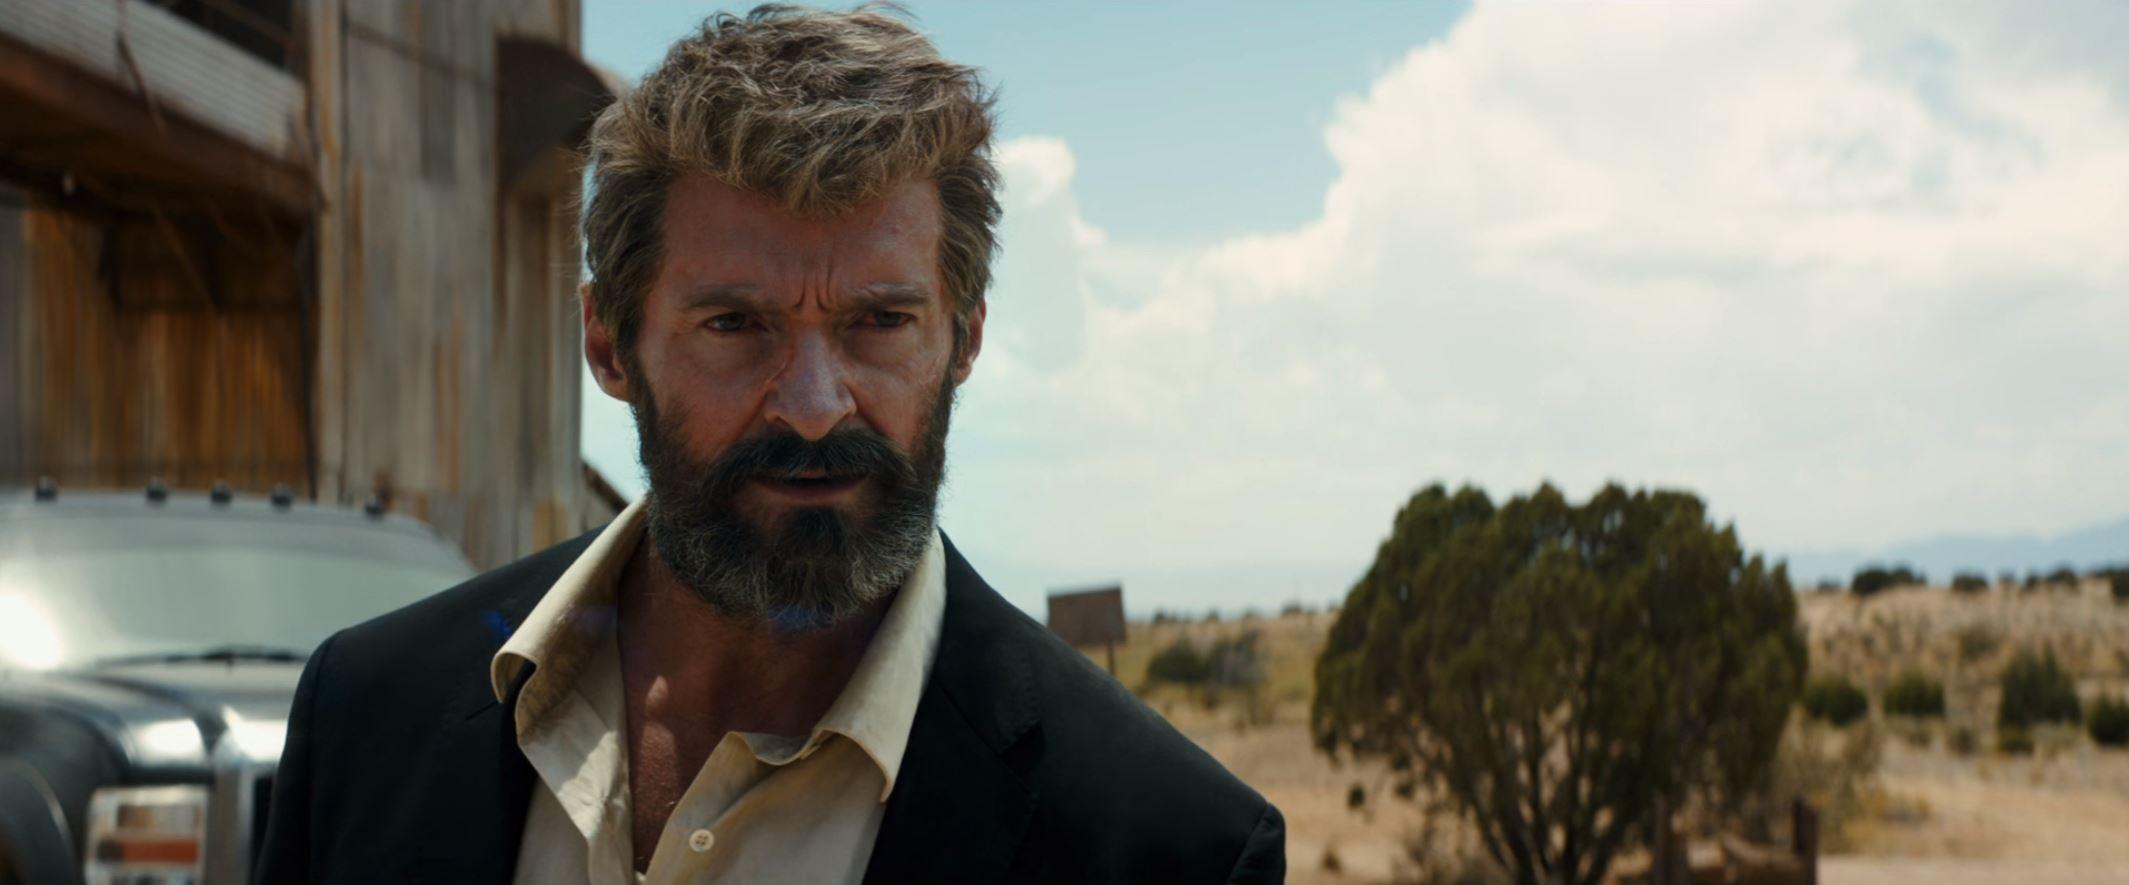 The Last Wolverine Film Trailer Is Here: 'Logan'